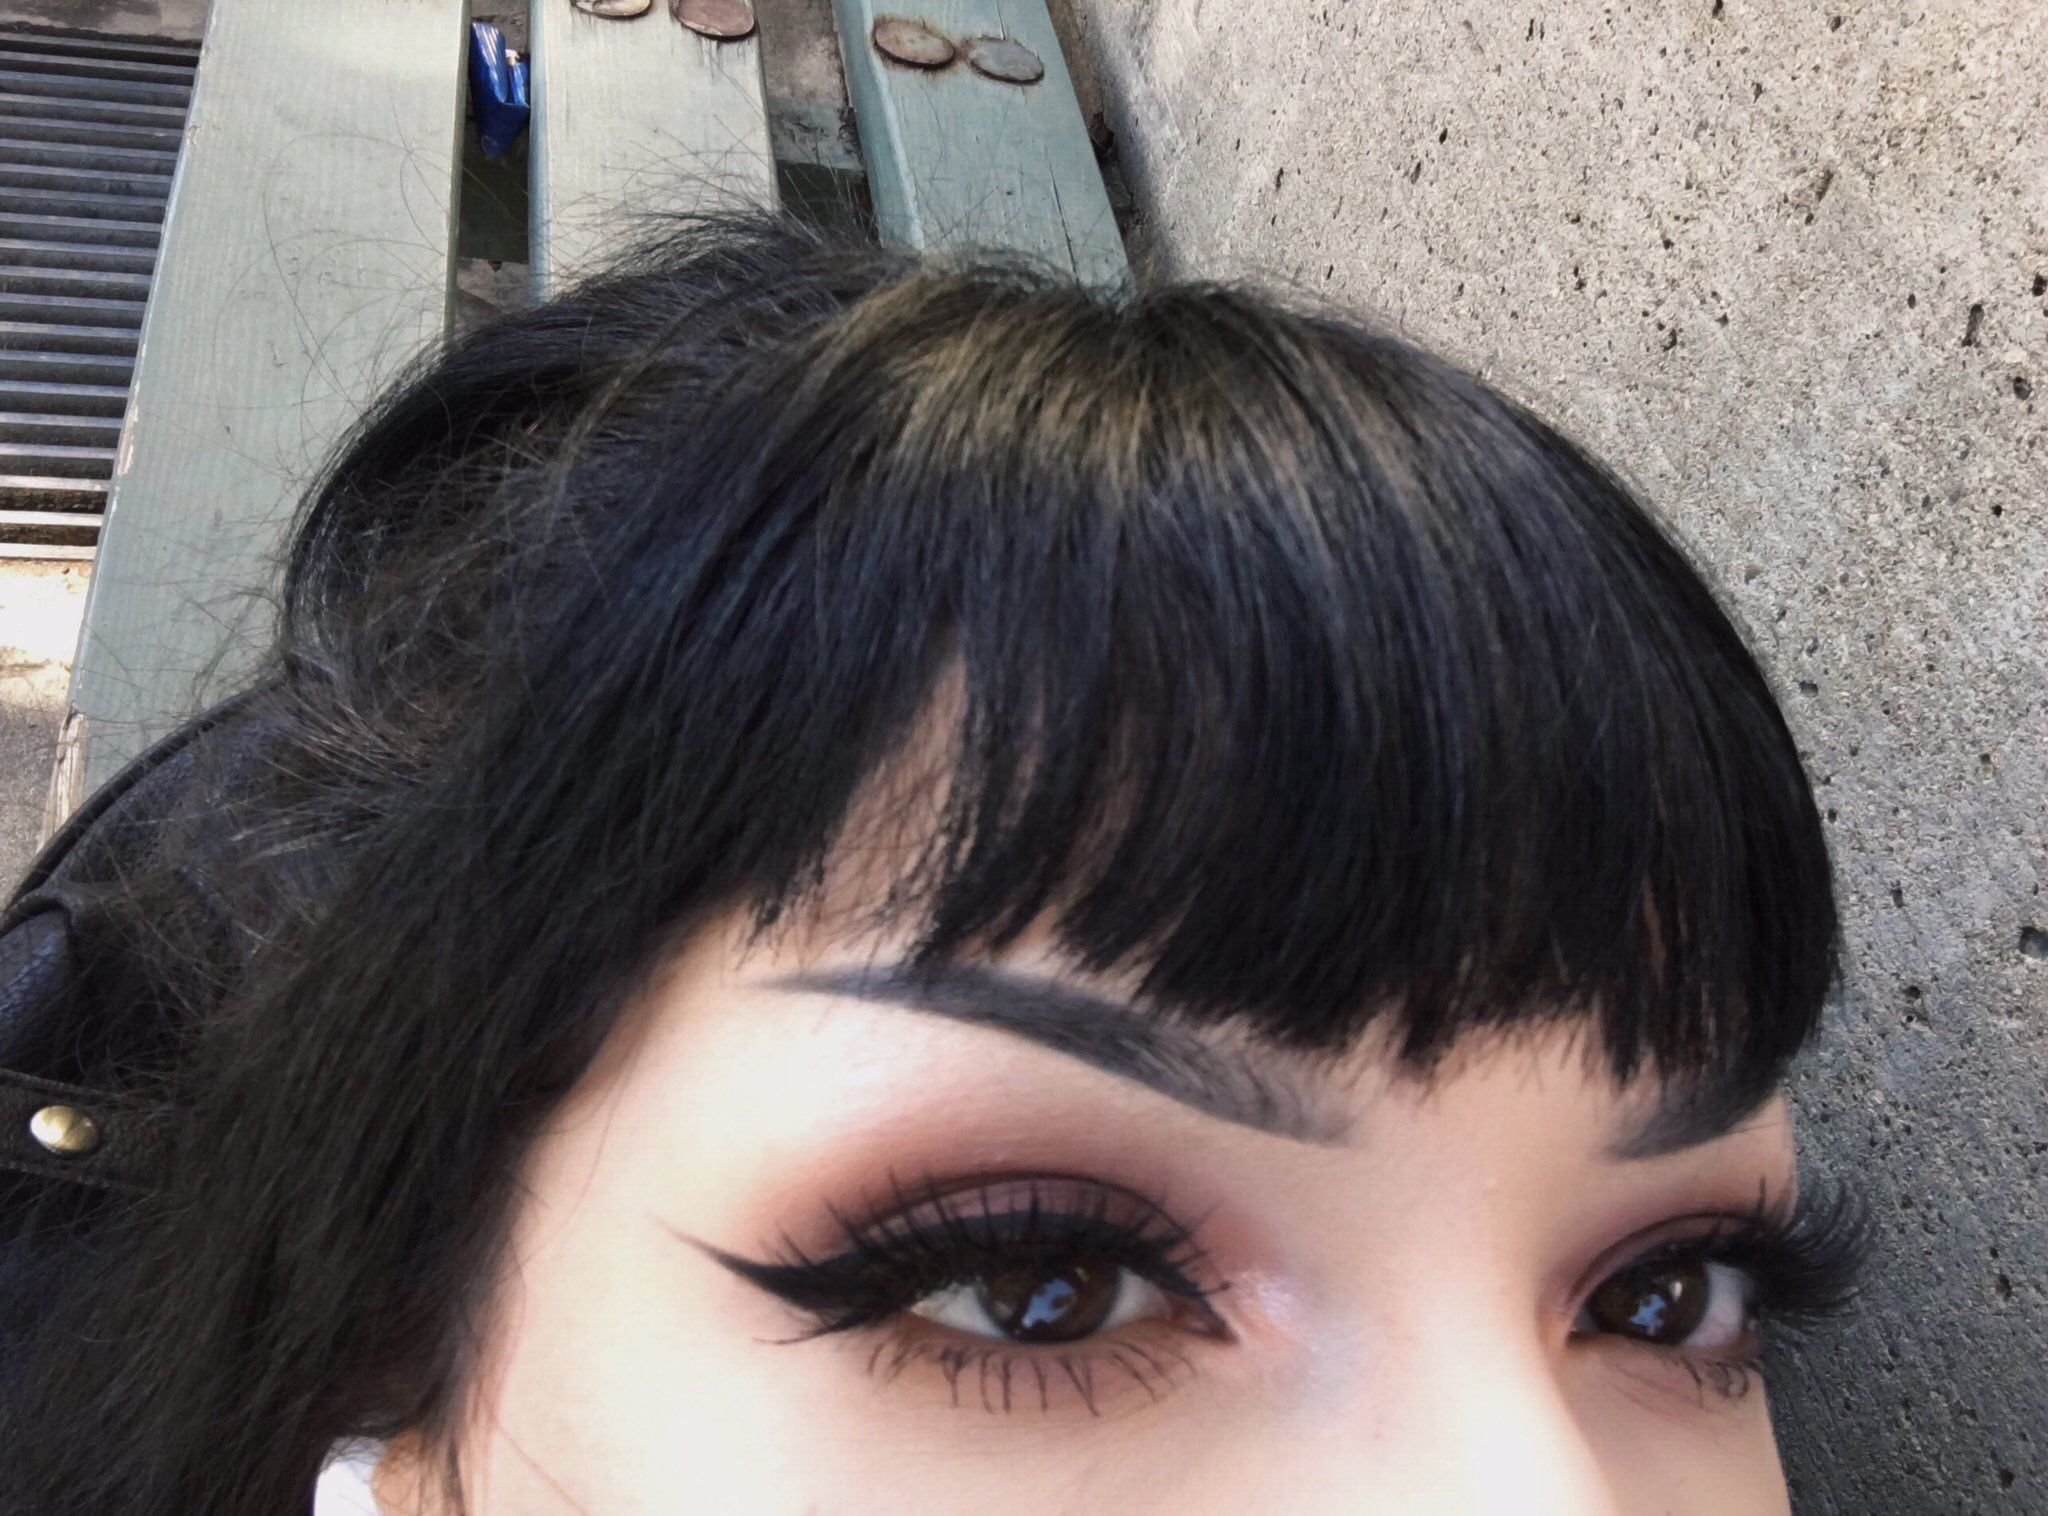 Makeup ✨ @nxlasmith